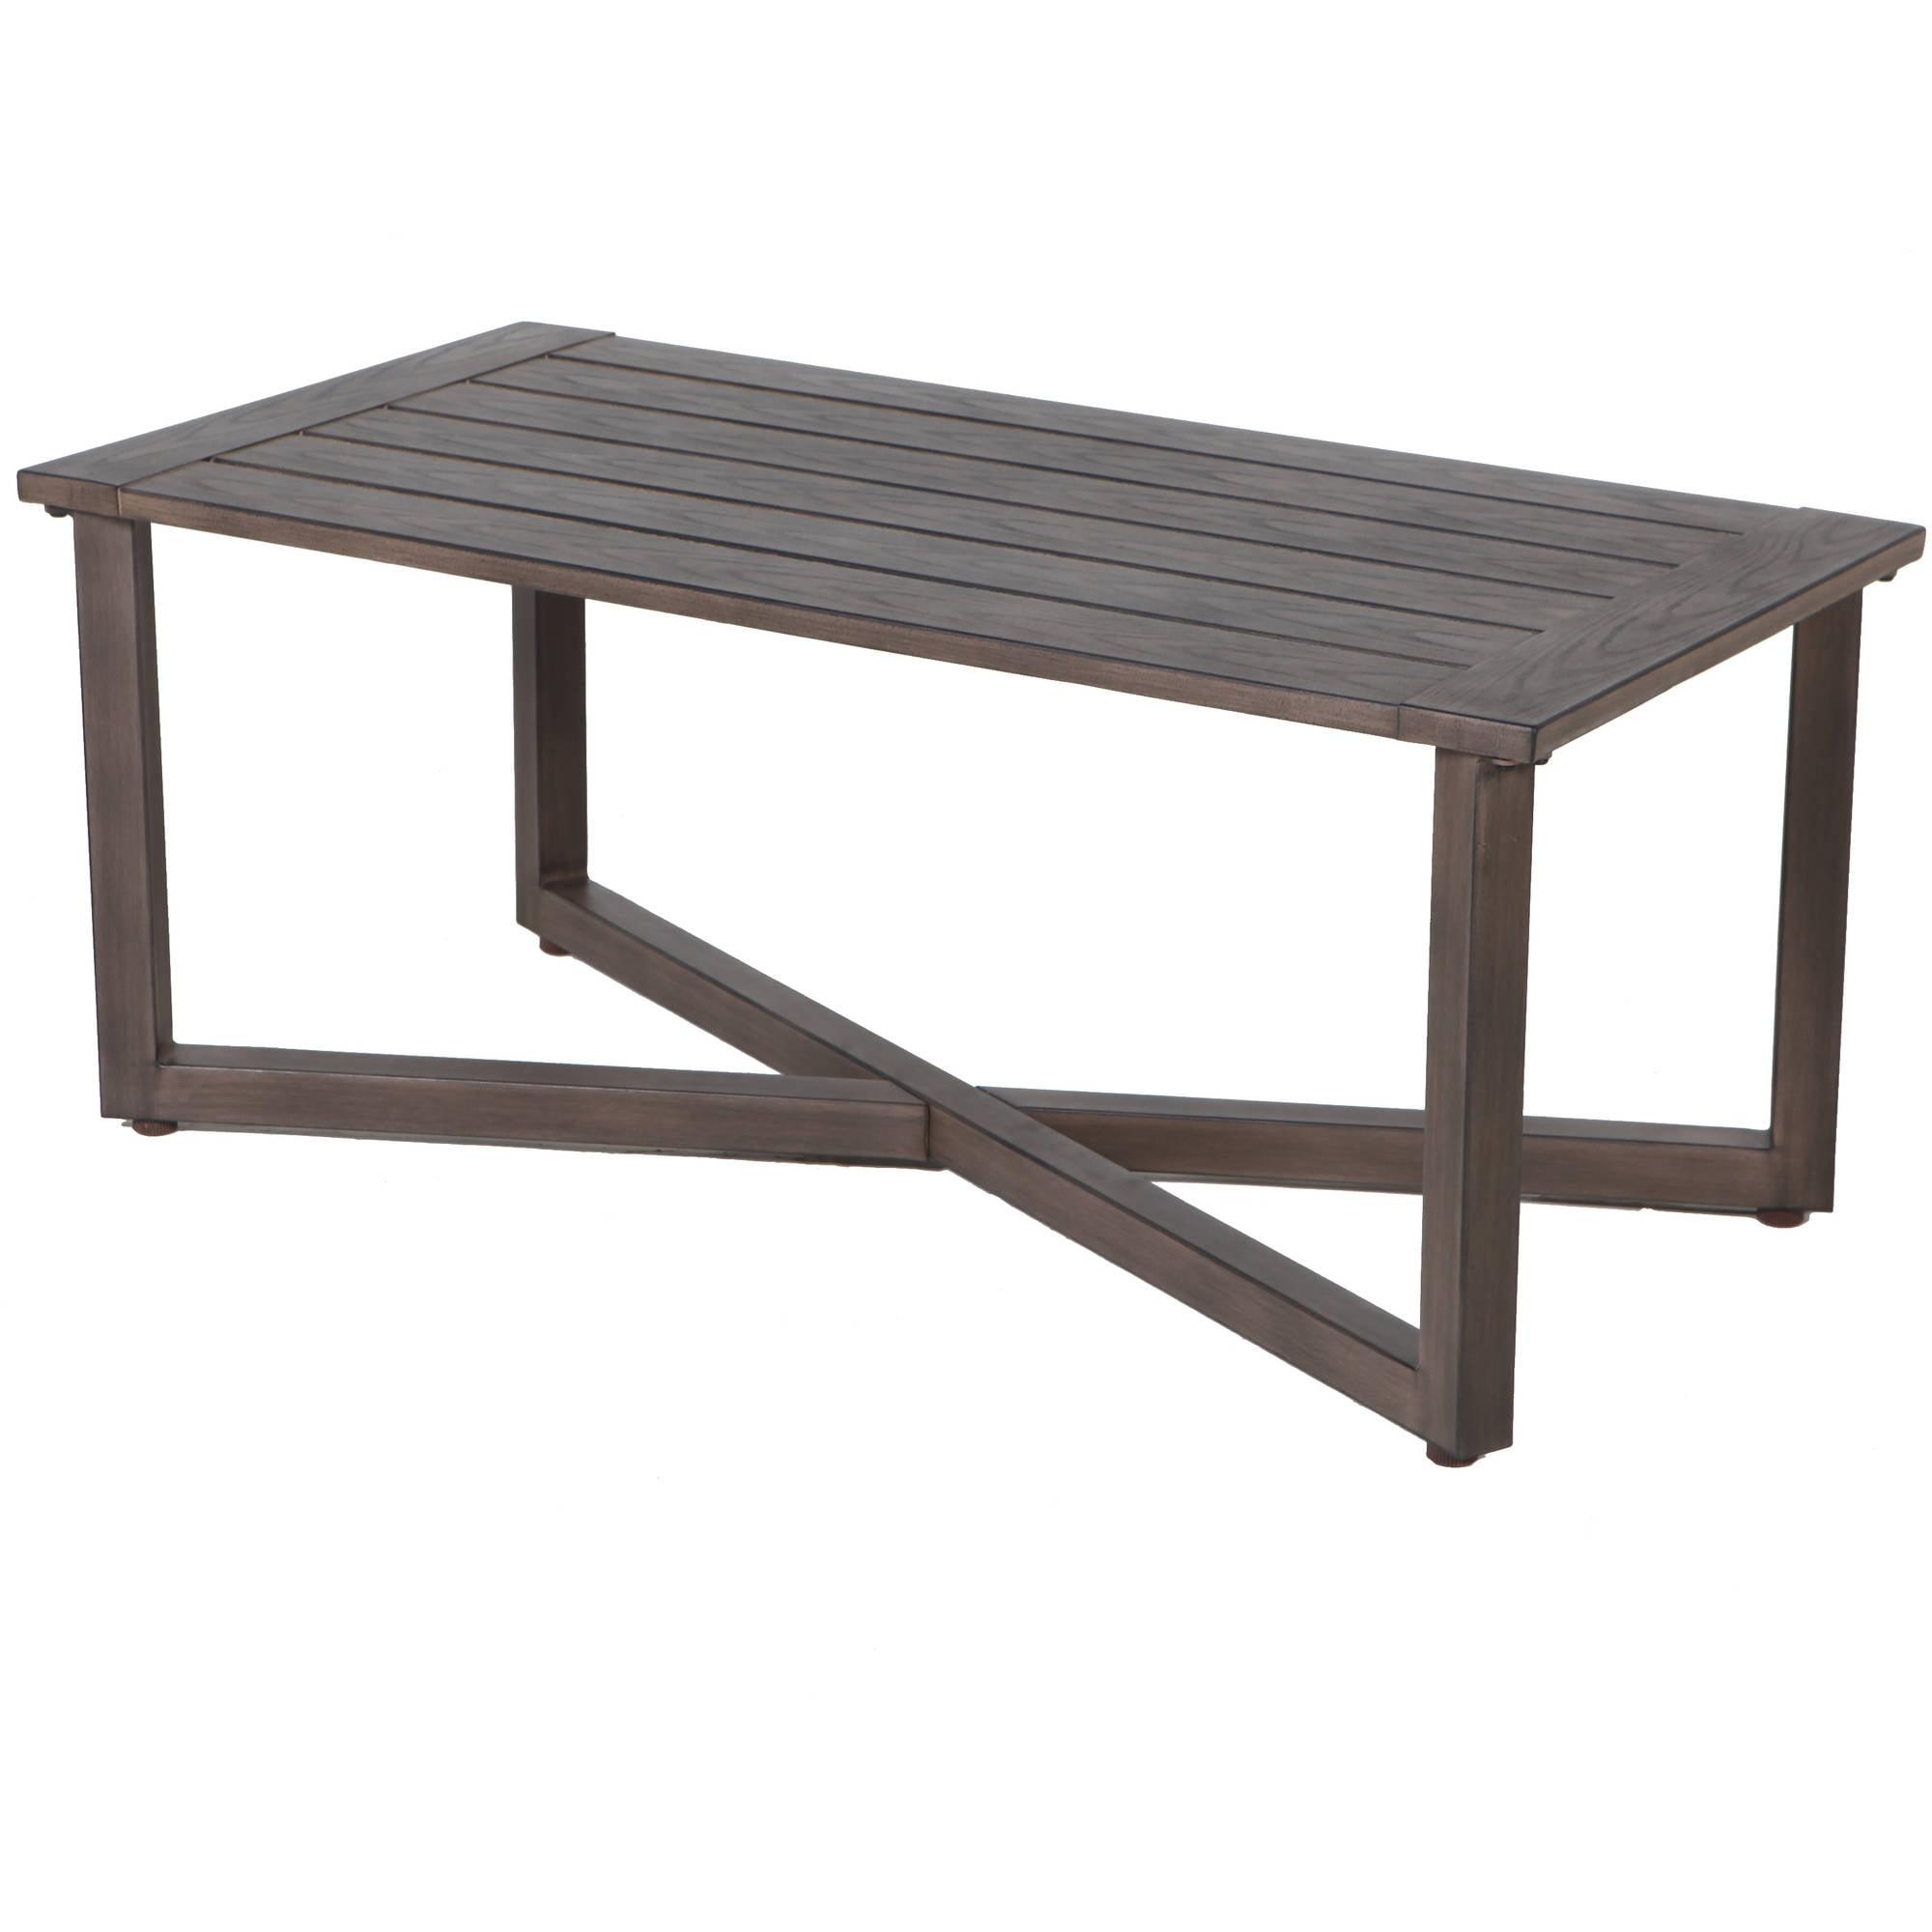 ridge furniture and walmart patio home azalea chaise better of garden com with outdoor lounge popular gardens homes